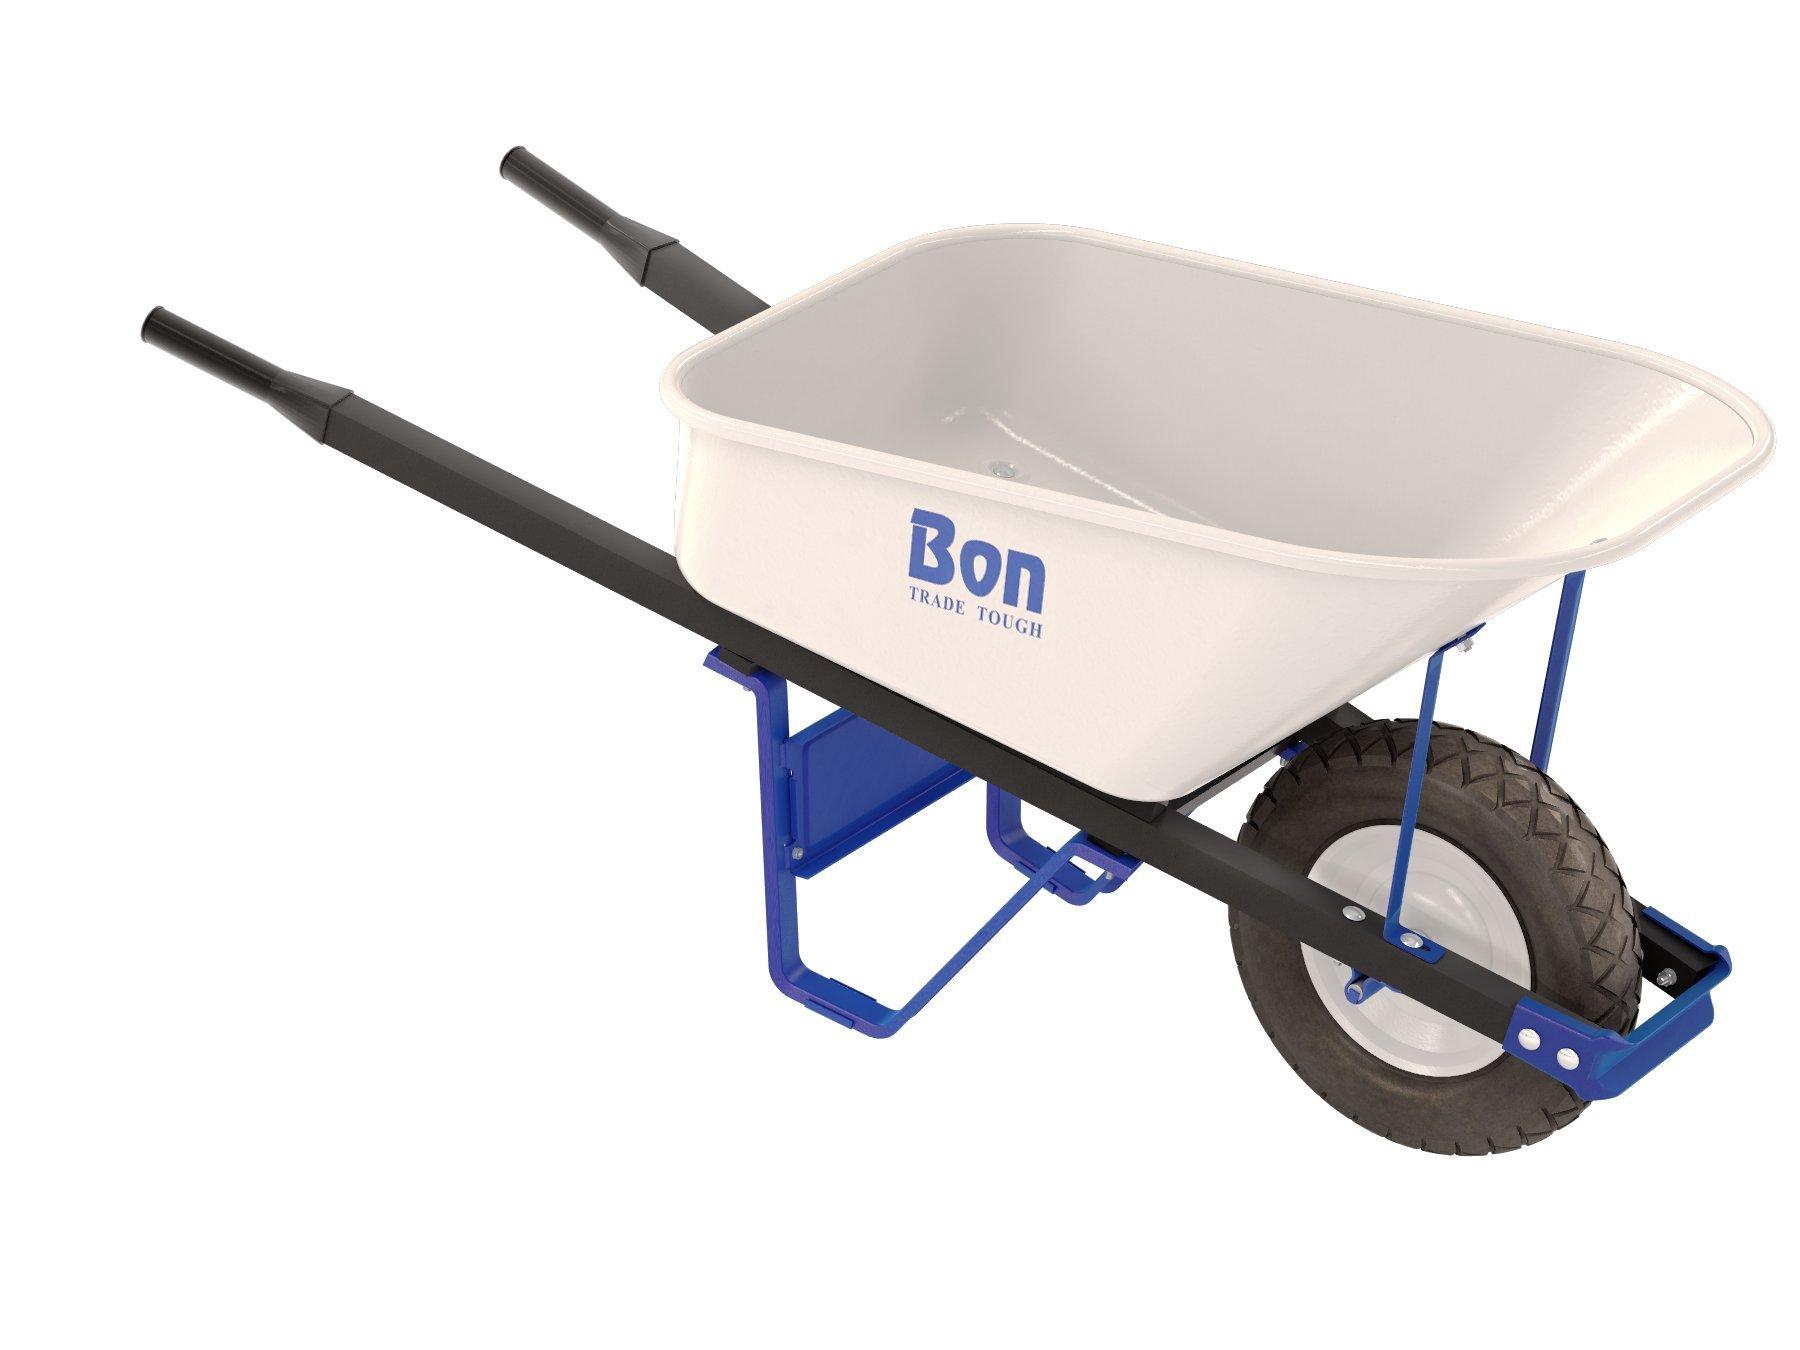 bon 84-974 Trade-Tough Steel Tray Wheelbarrow, 16 Cu. Ft. by bon